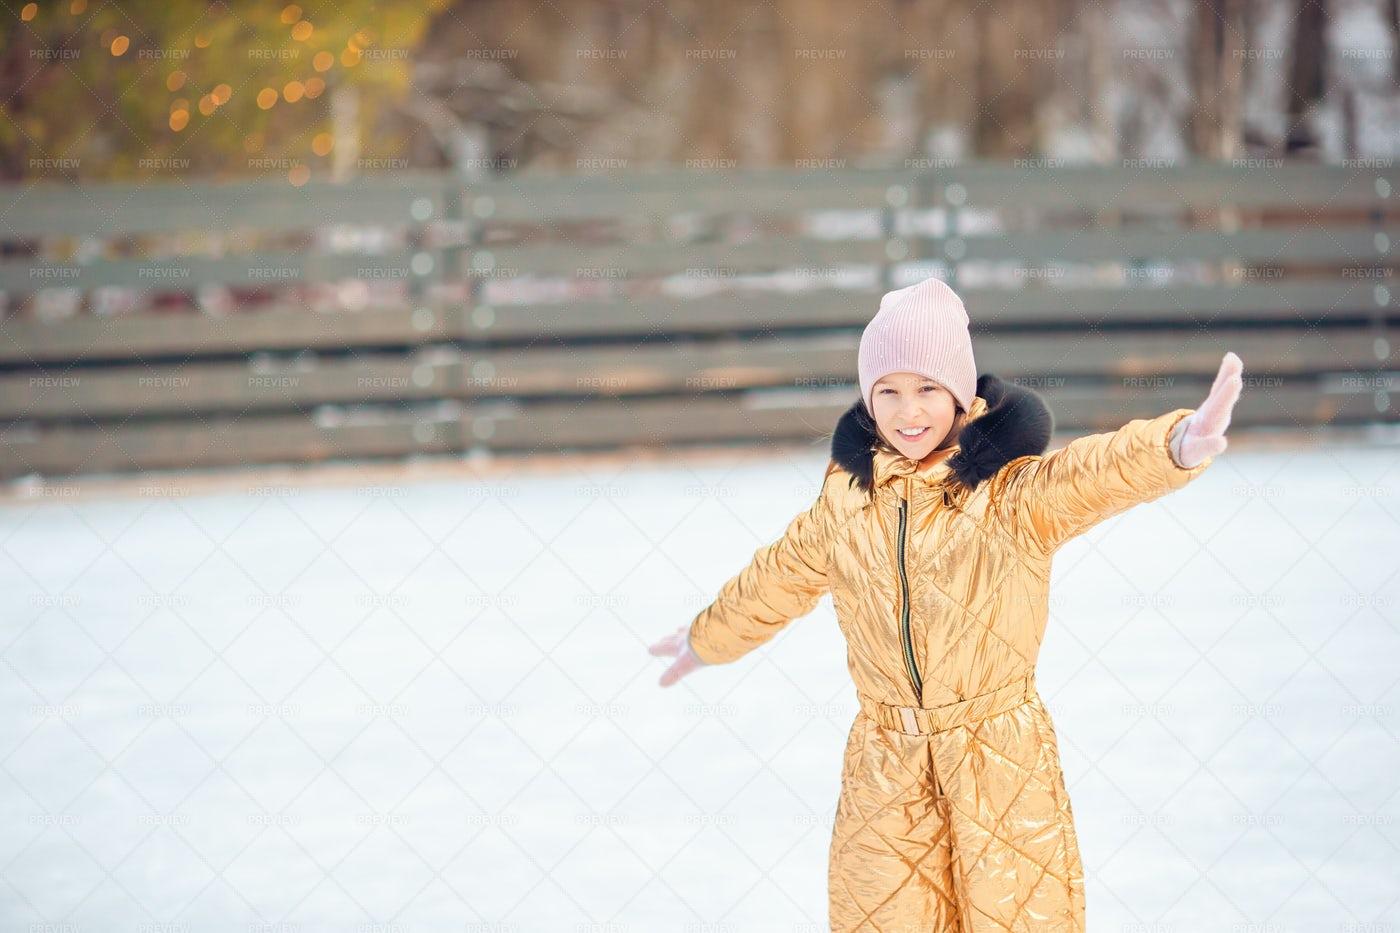 Girl Skating On Ice: Stock Photos